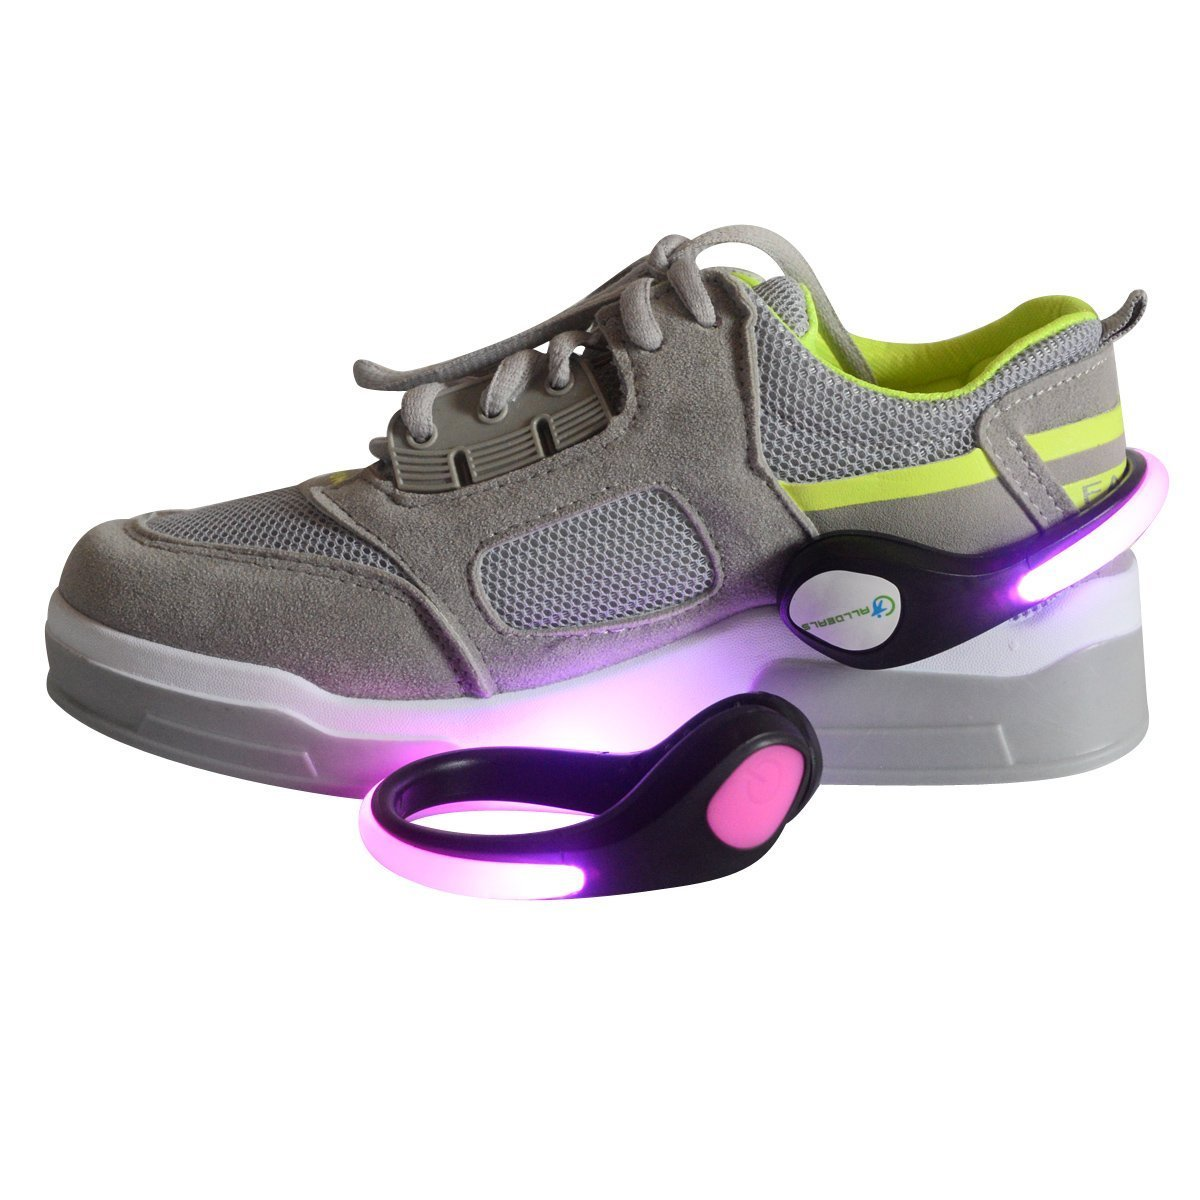 Colorful LED Flash Shoe Clip Lights - J&Y Distribution